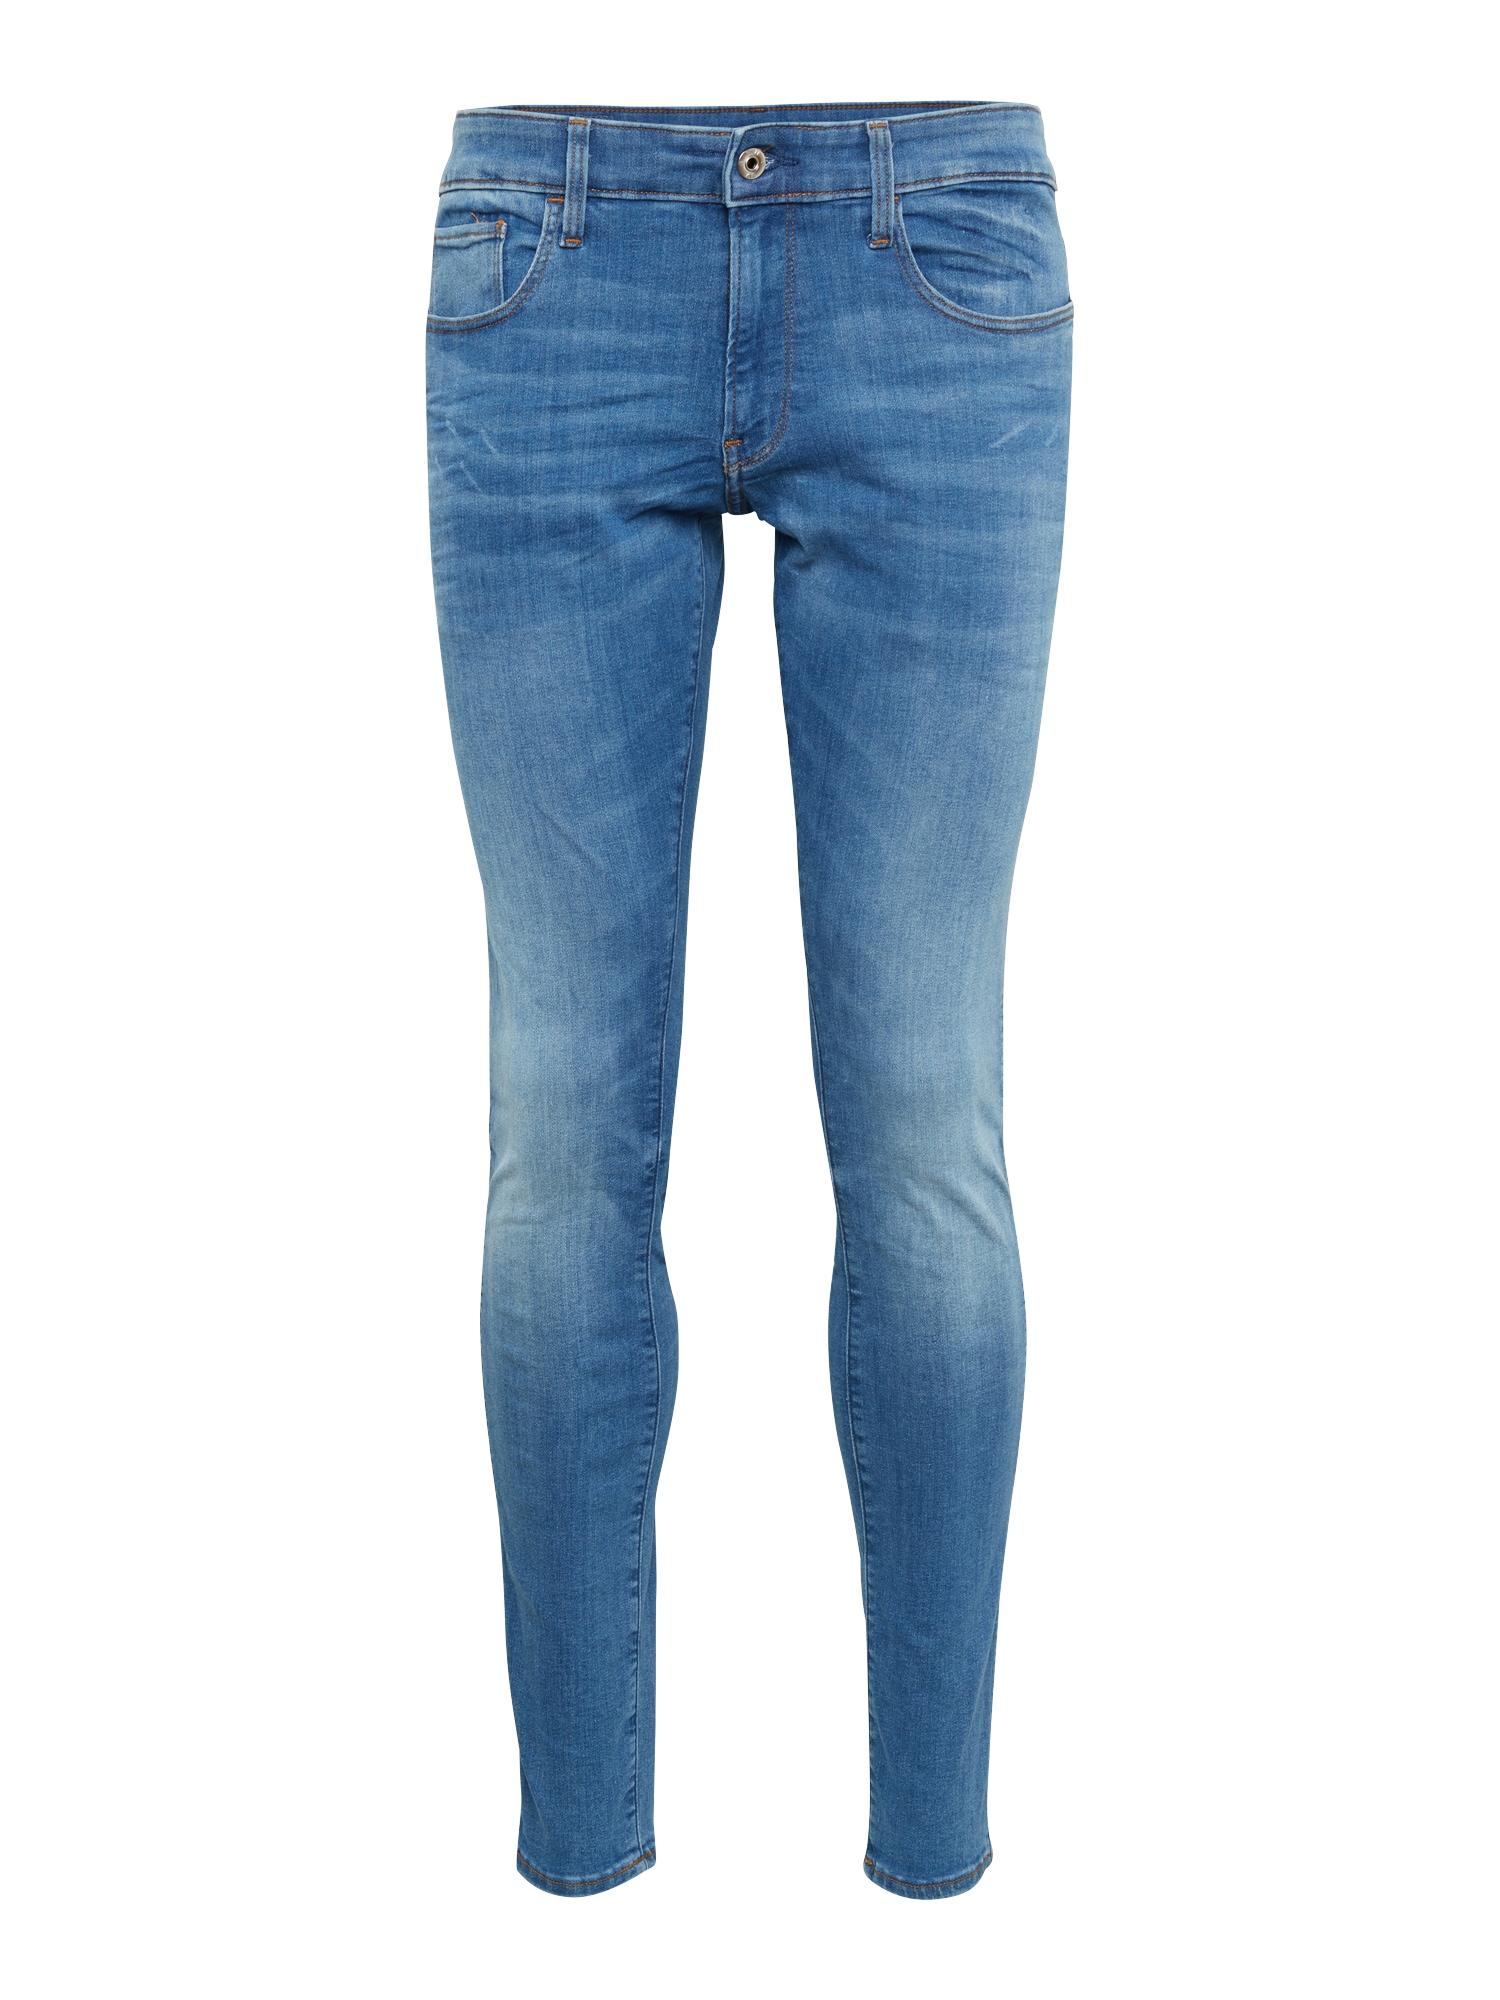 G-STAR RAW Heren Jeans 3301 Deconstructed Skinny blauw denim